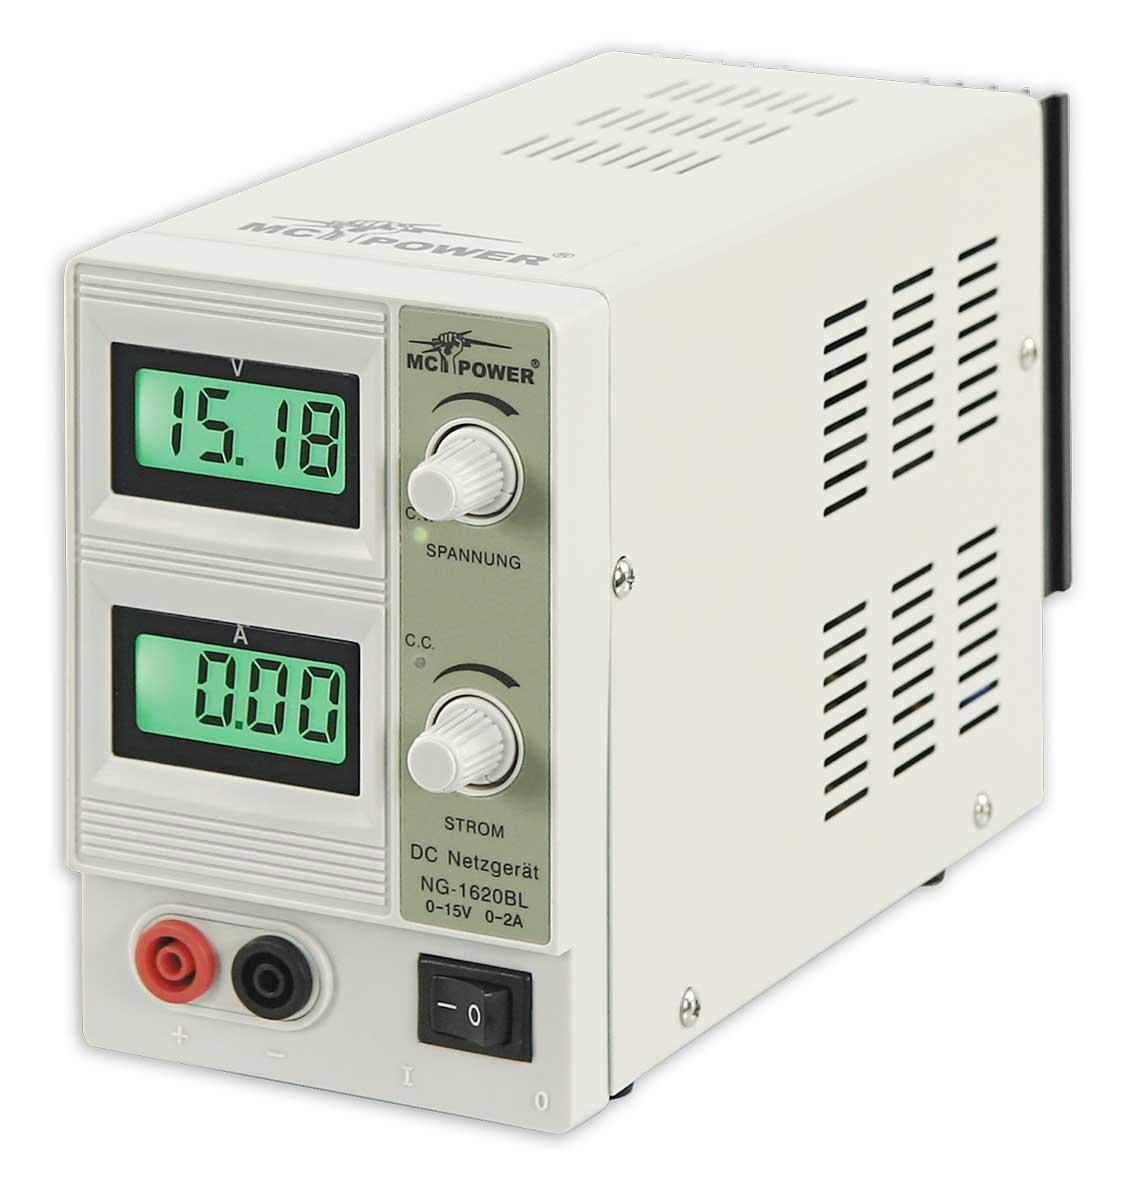 Labornetzgerät 0-15V 2A LC-Display